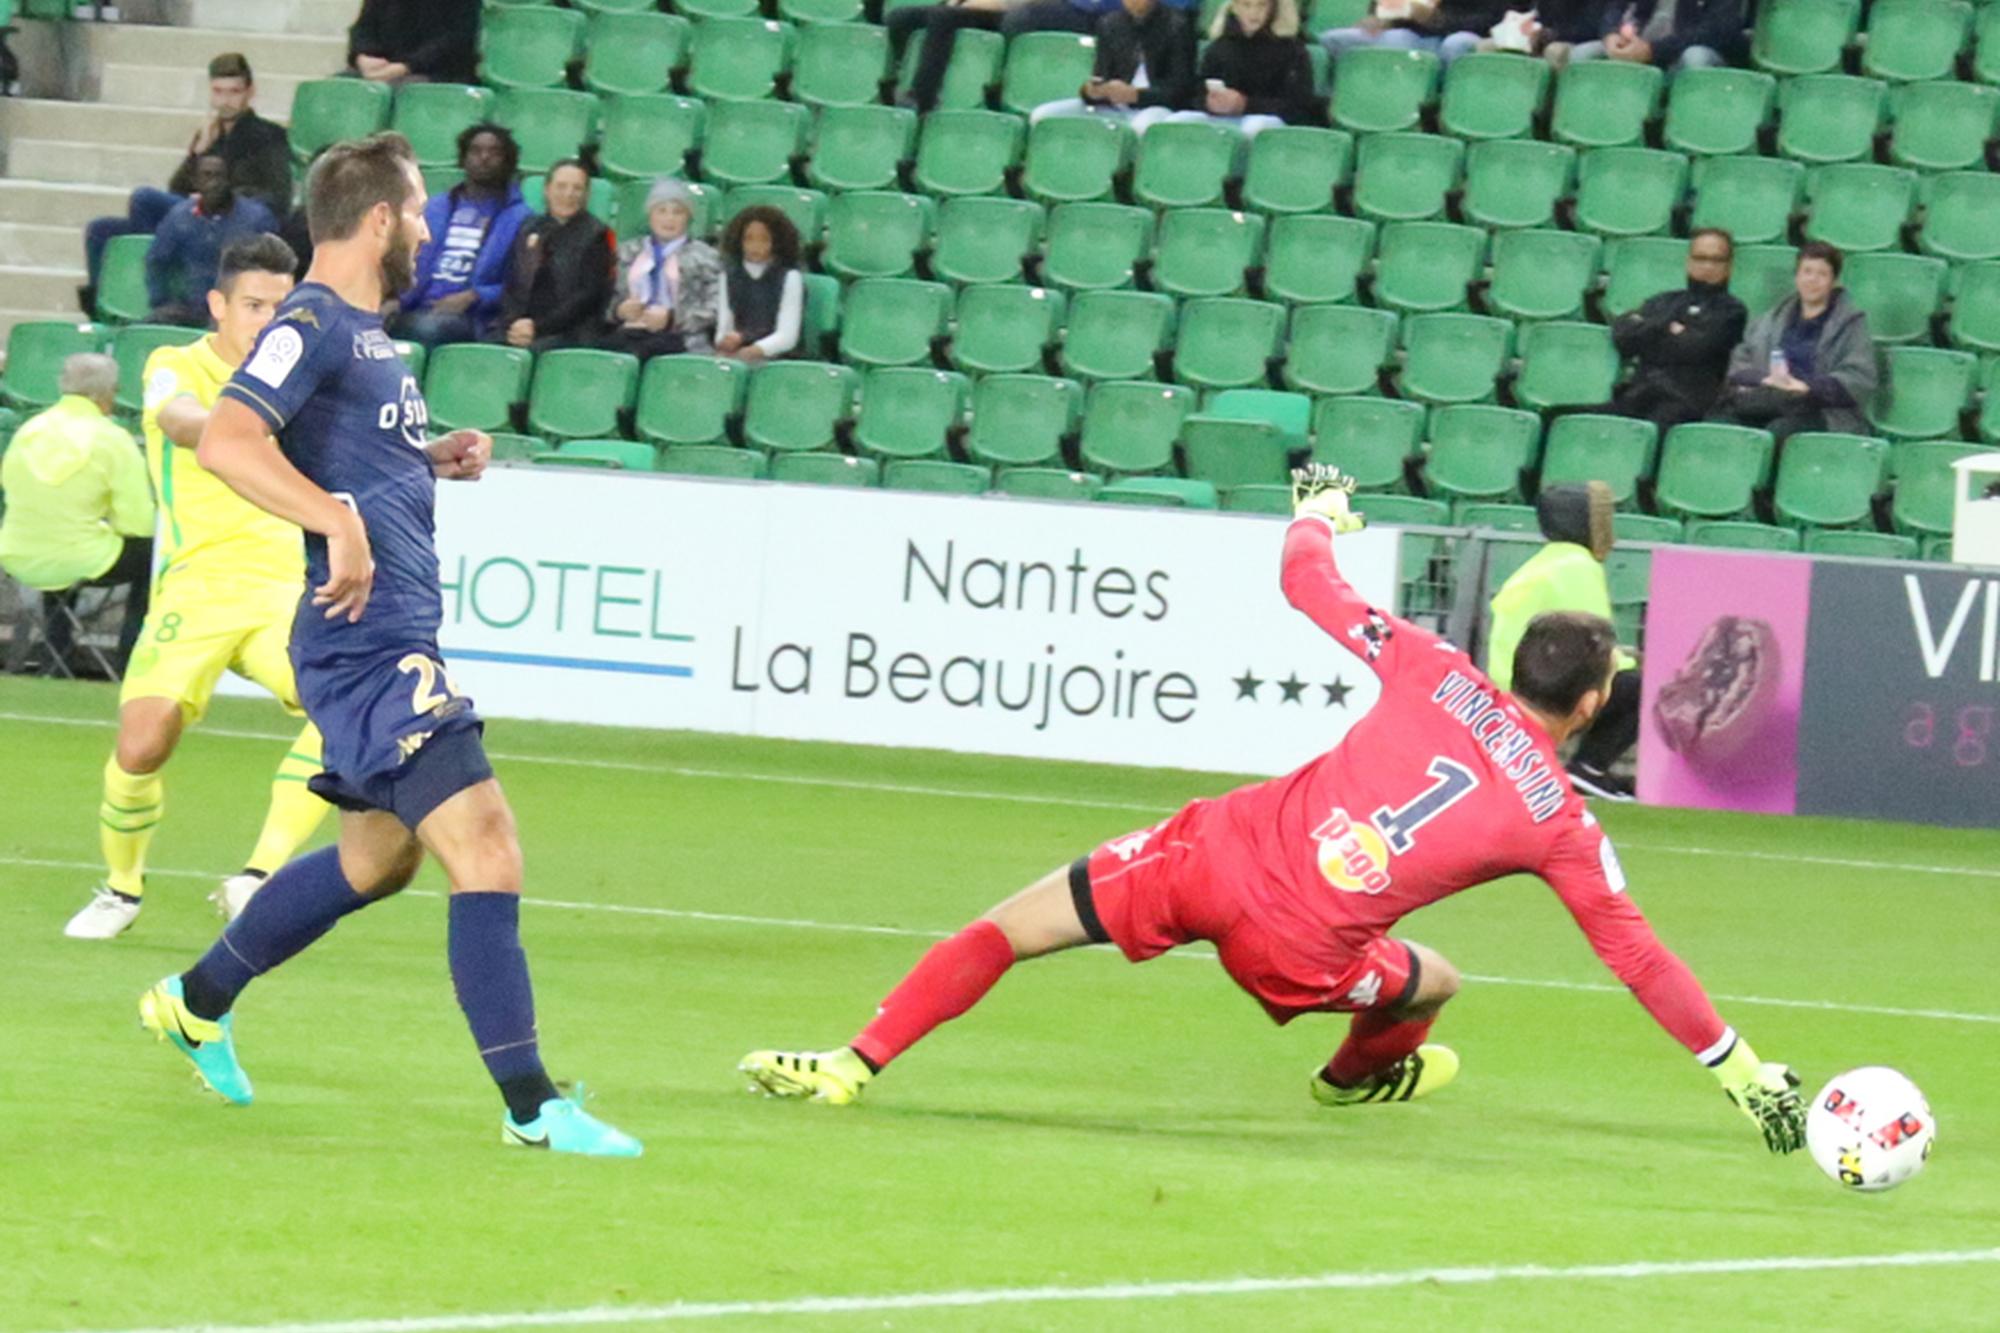 Nantes - Bastia